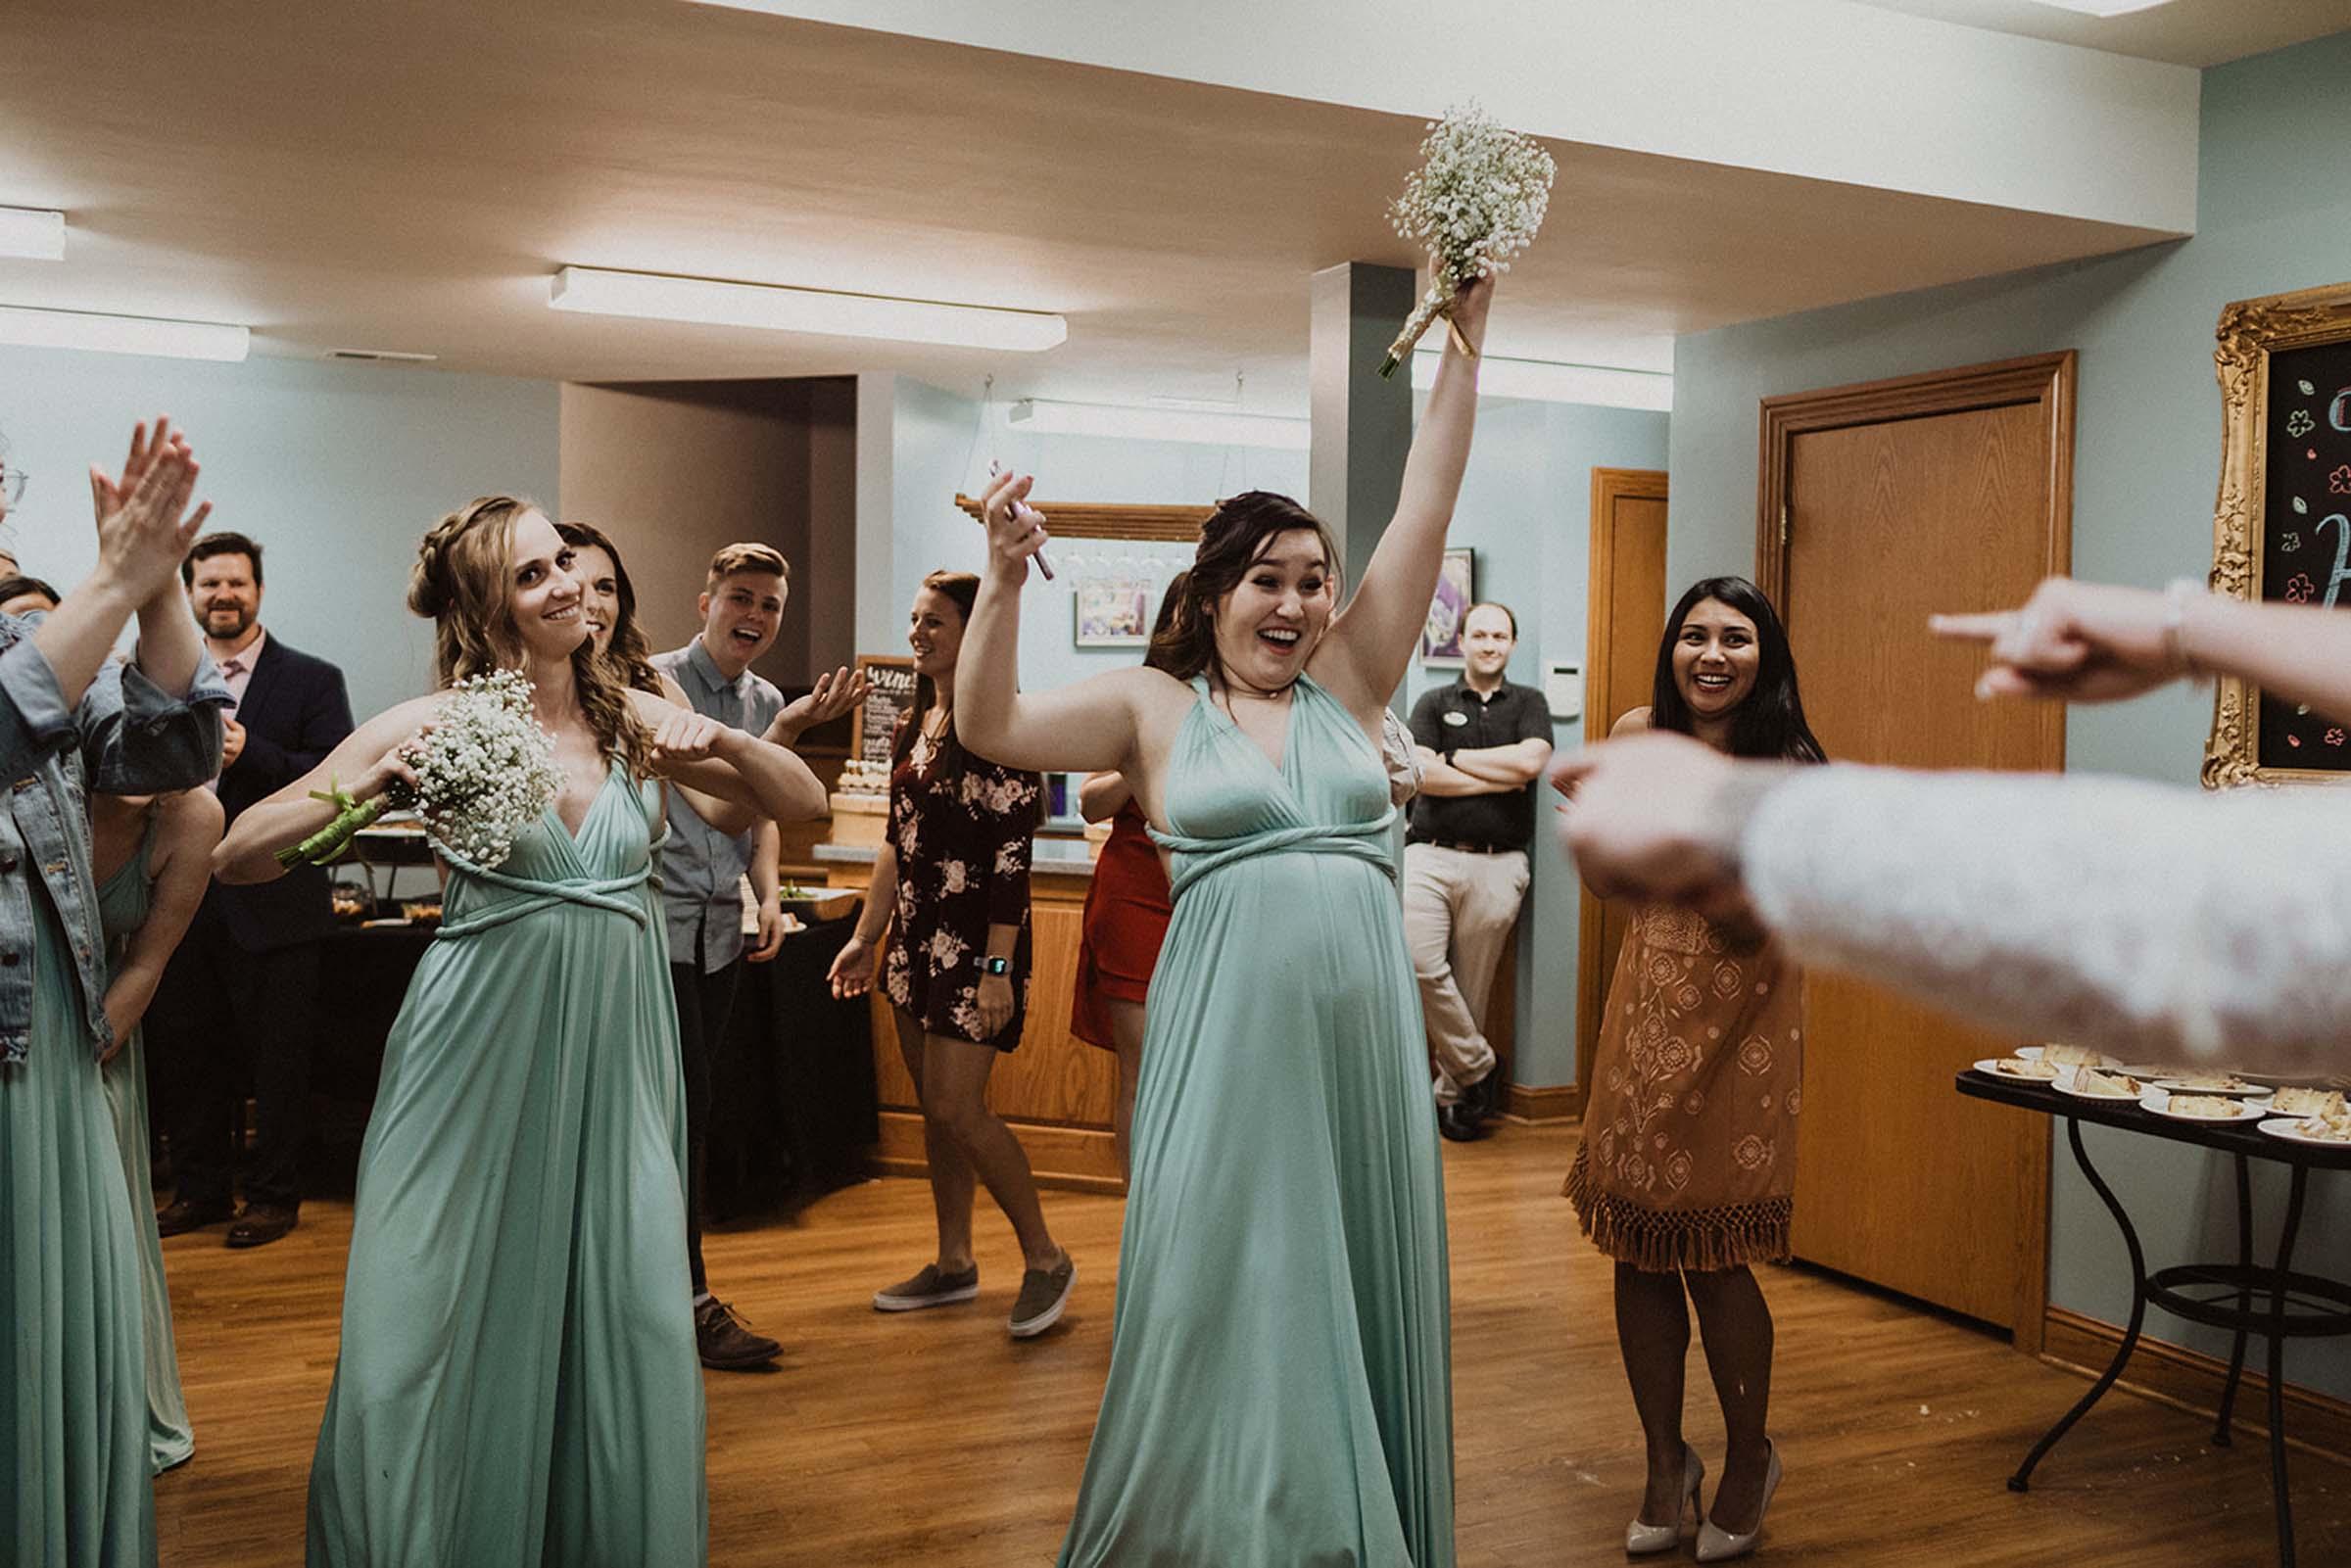 Kelsey Rae Lucas same-sex lesbian couple bi racial Virginia America wedding photography Dancing With Her directory magazine